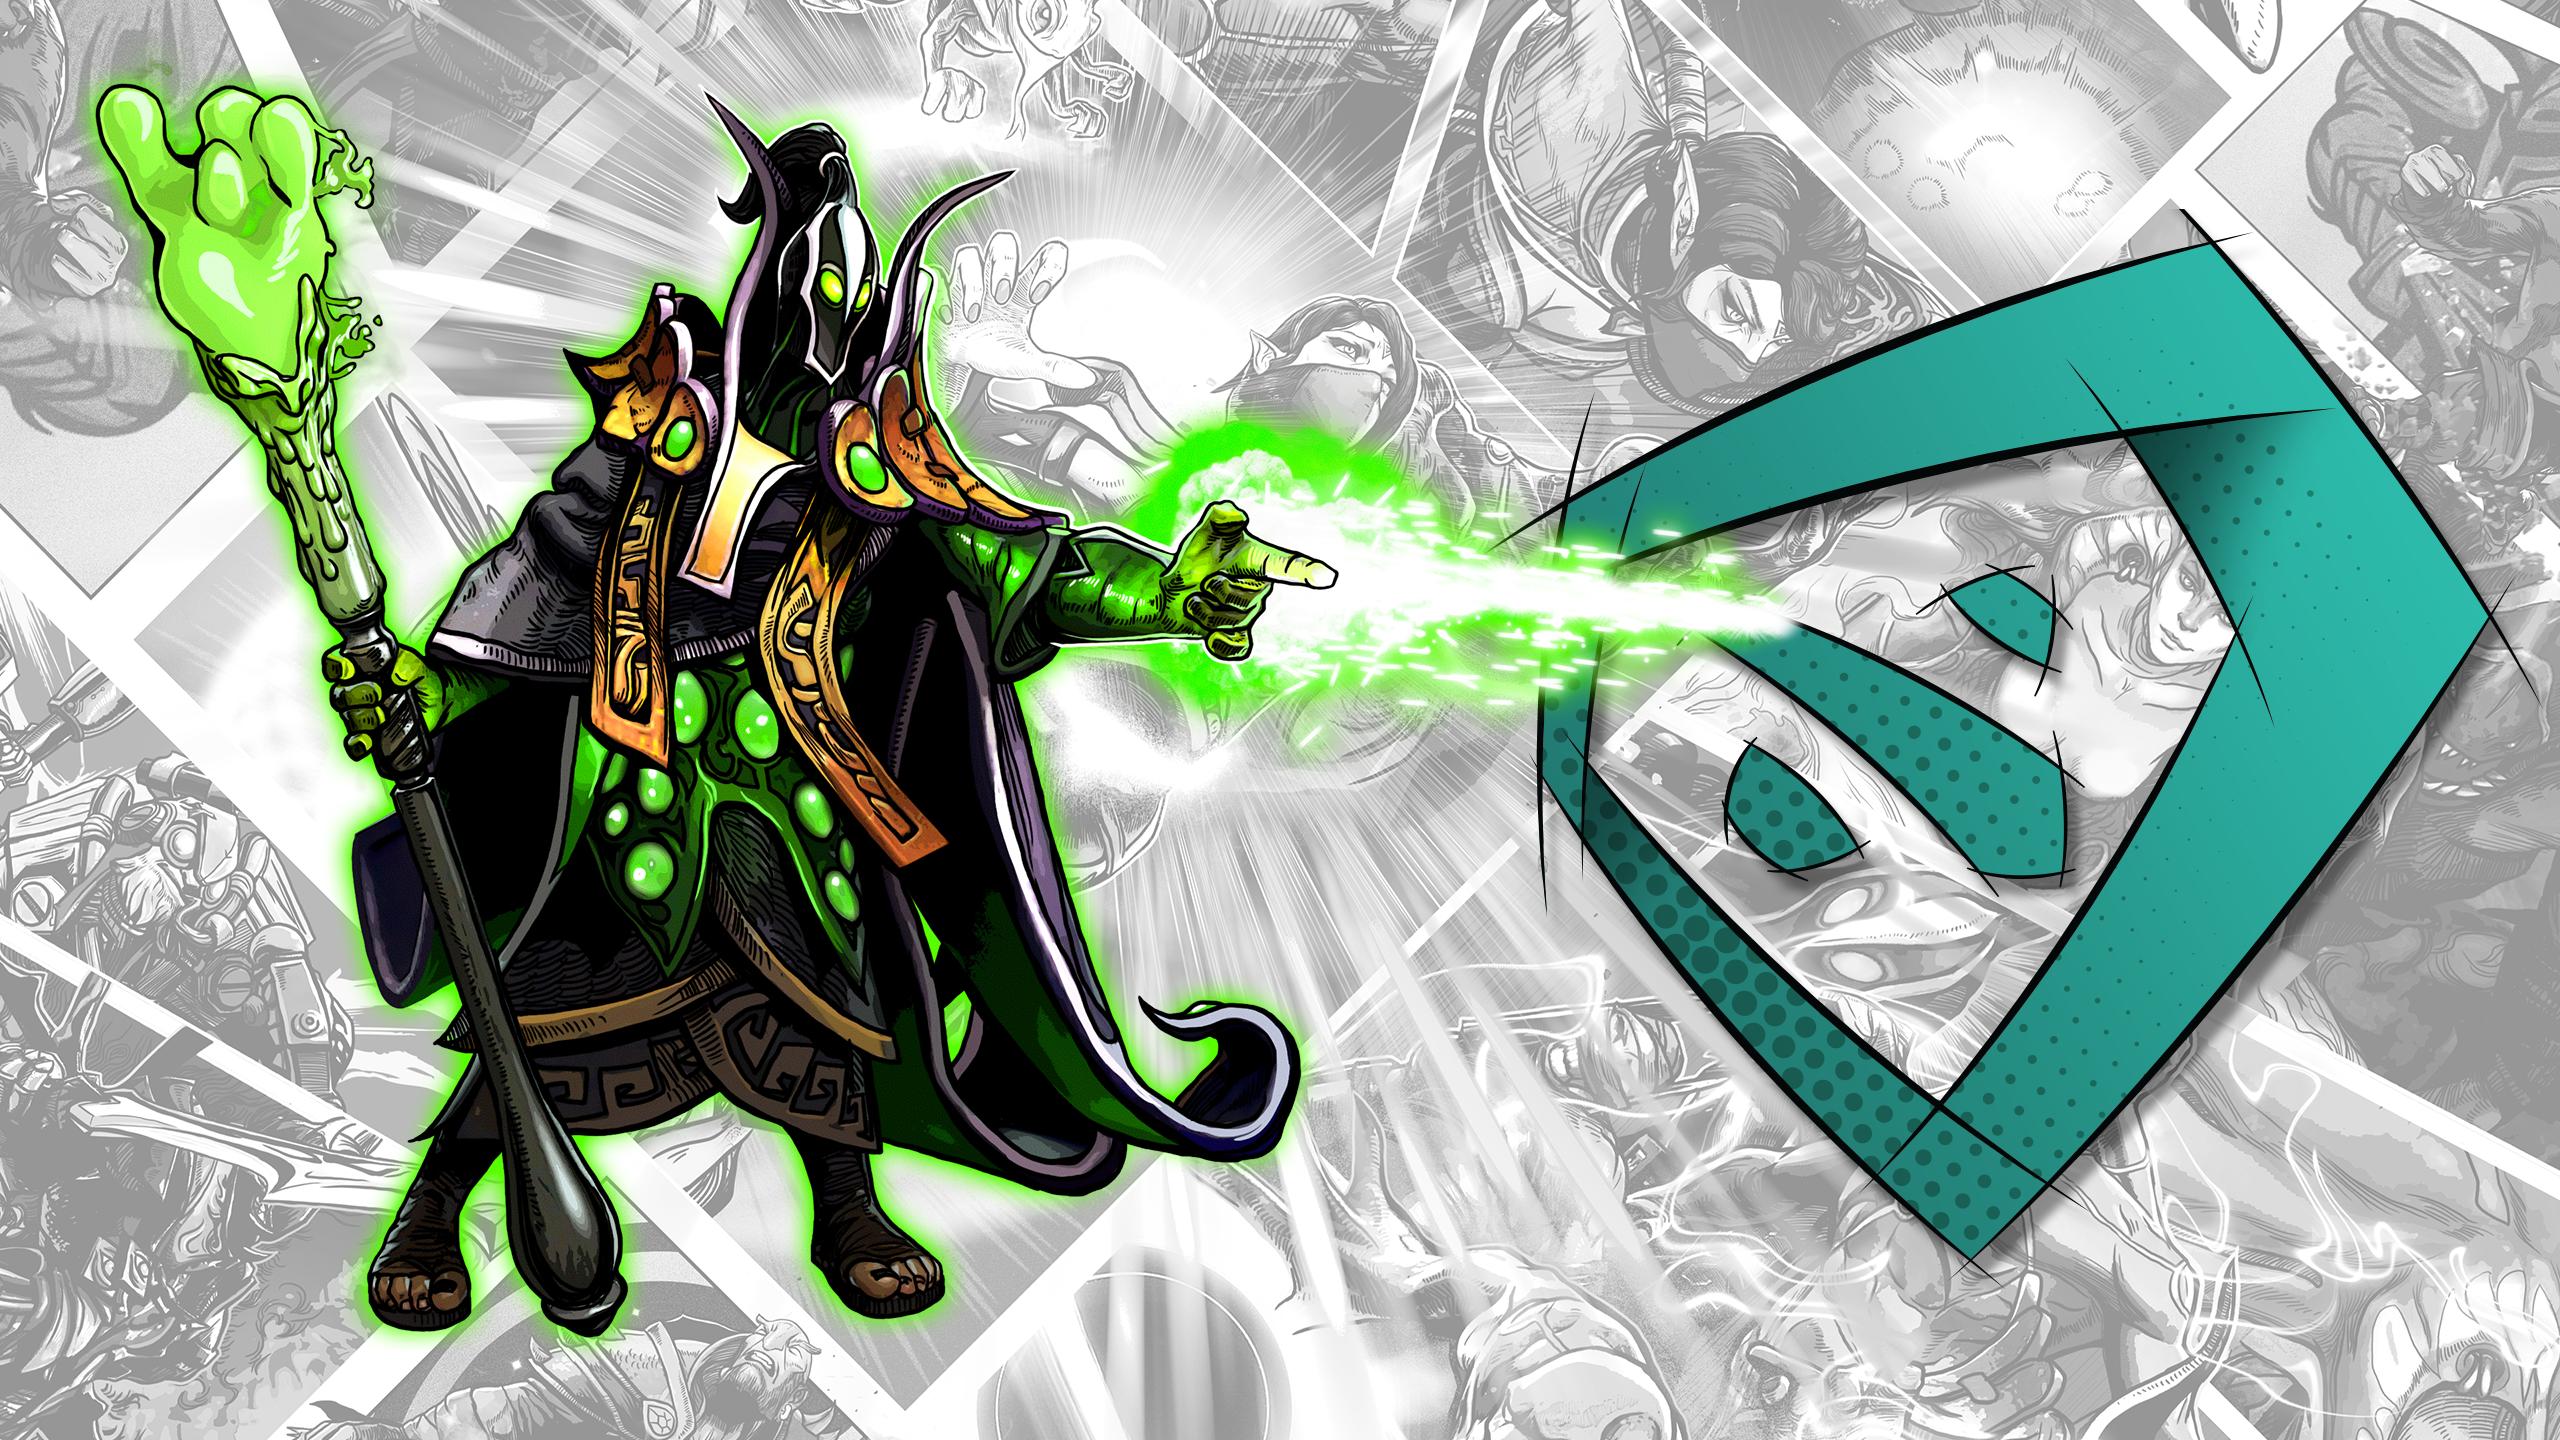 Wallpaper Dota 2 Defense Of The Ancients Valve Games Art